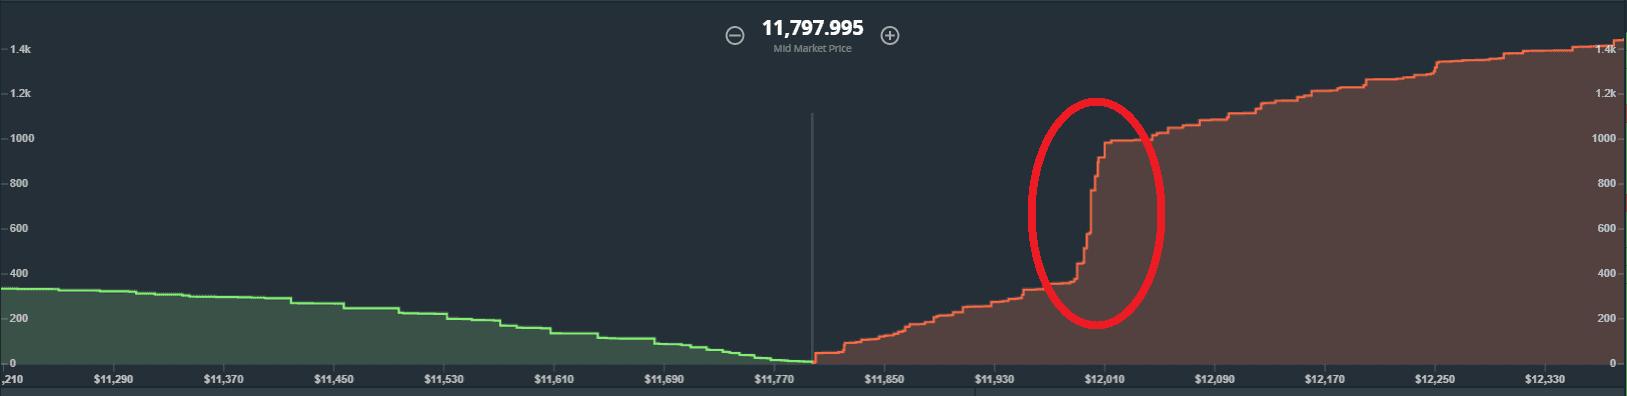 gdax depth chart BTC USD paywall